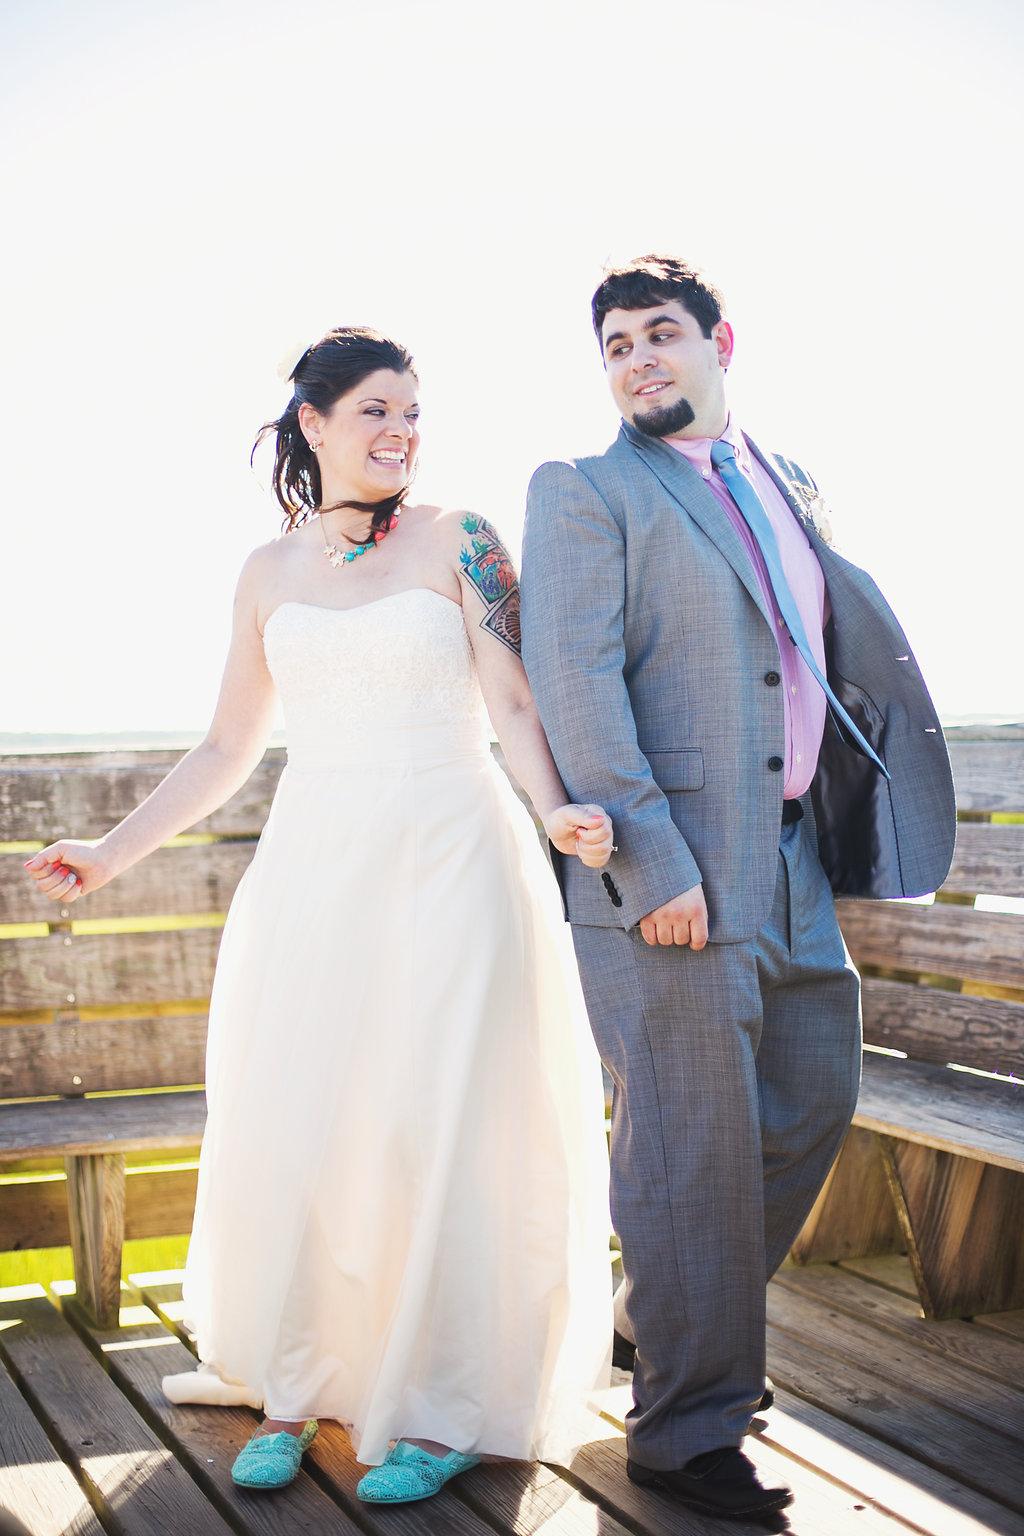 Laura + Matt Featured DIY Wedding // The Overwhelmed Bride Bridal Lifestyle + Wedding Blog // First Look